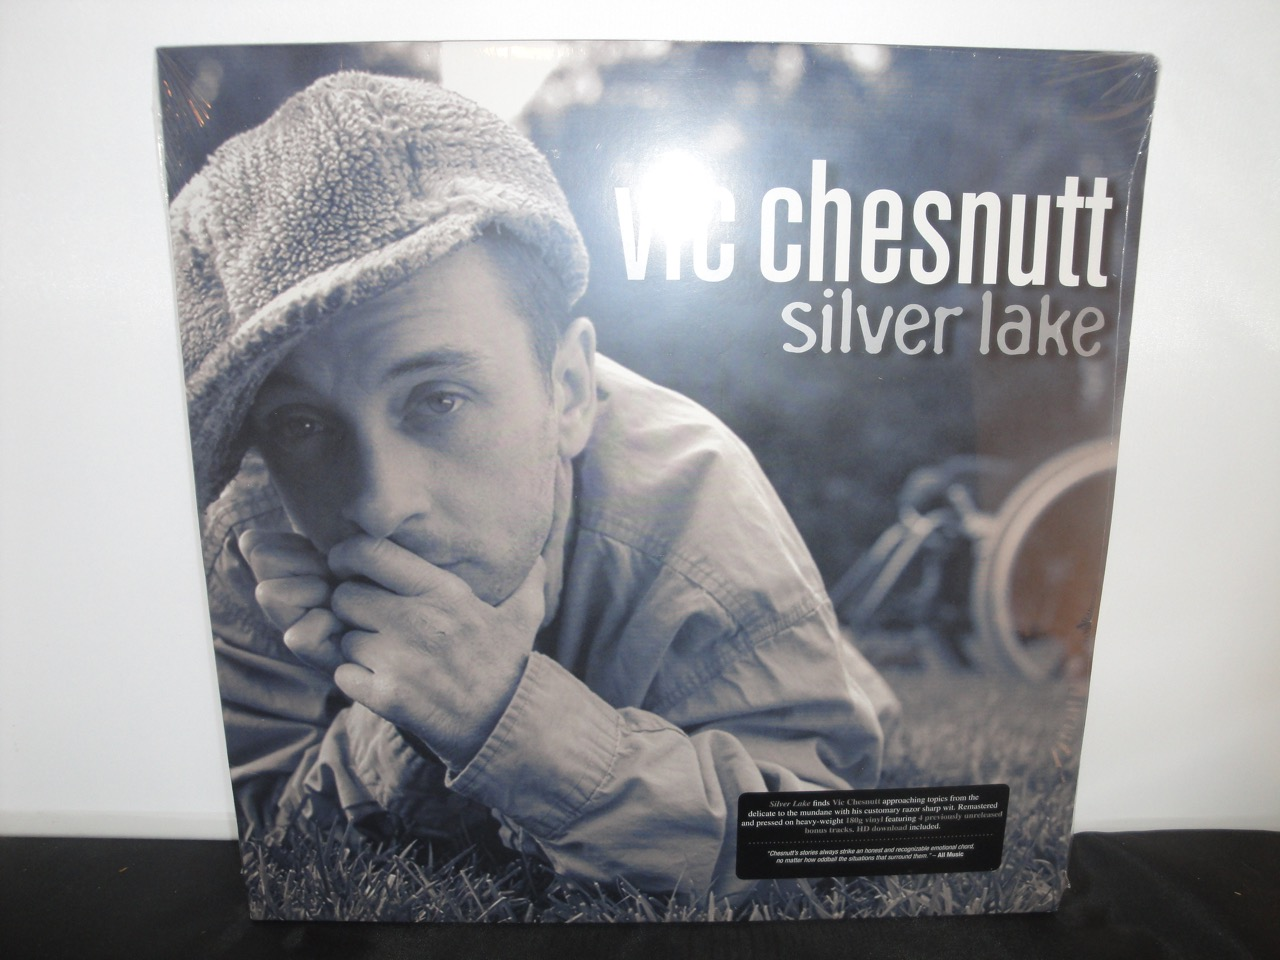 Vic Chesnutt - Silver Lake - 2XLP, 2017, Double Vinyl Reissue